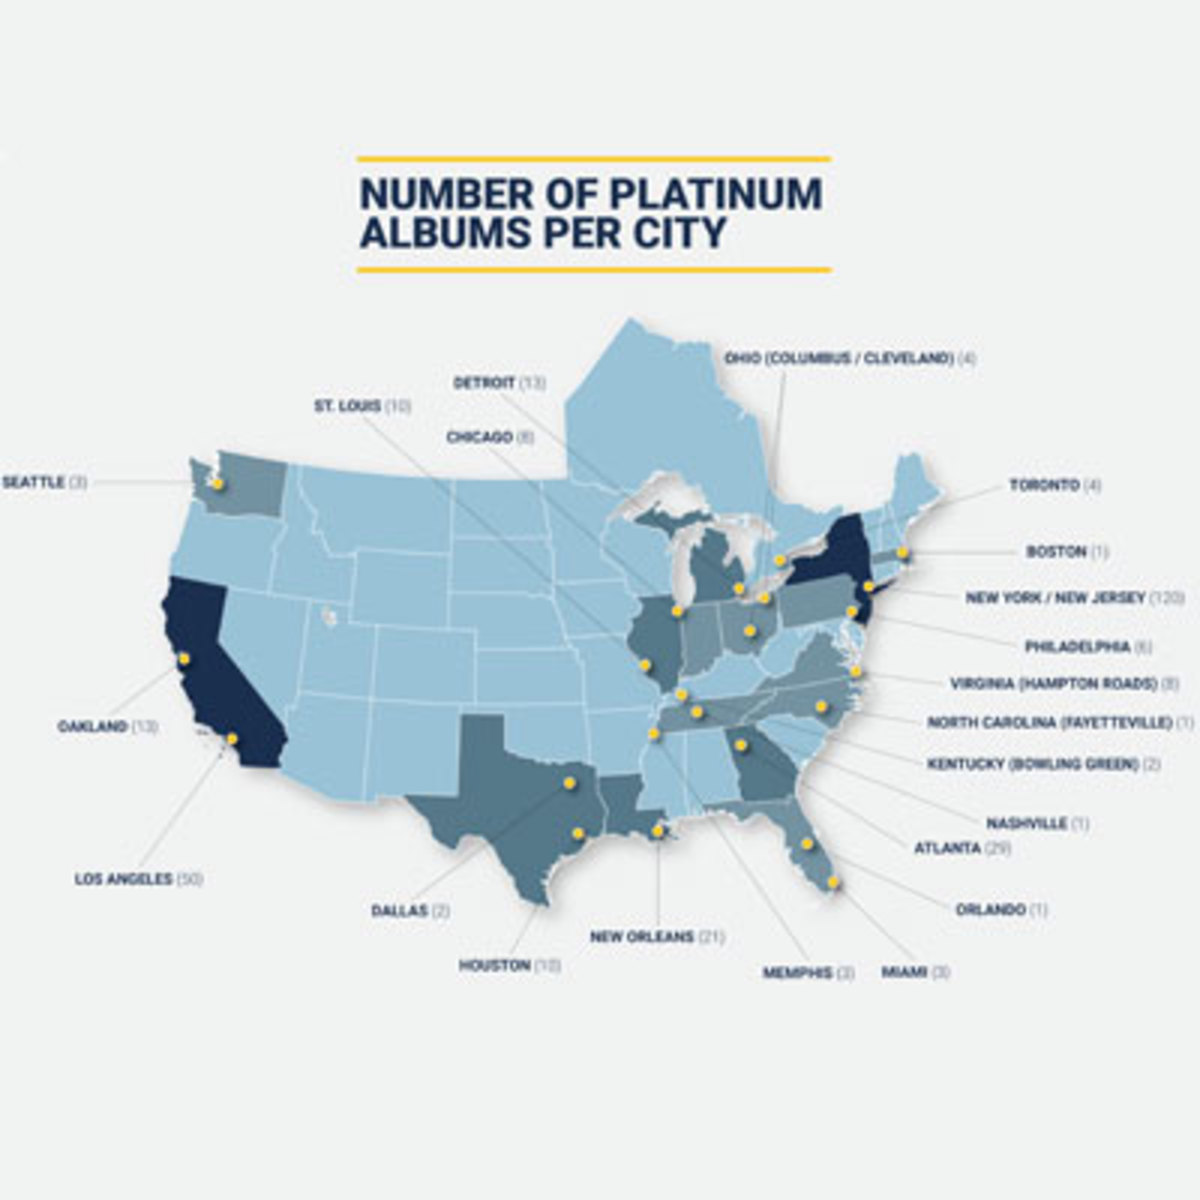 platinum-albums-by-city-main.jpg